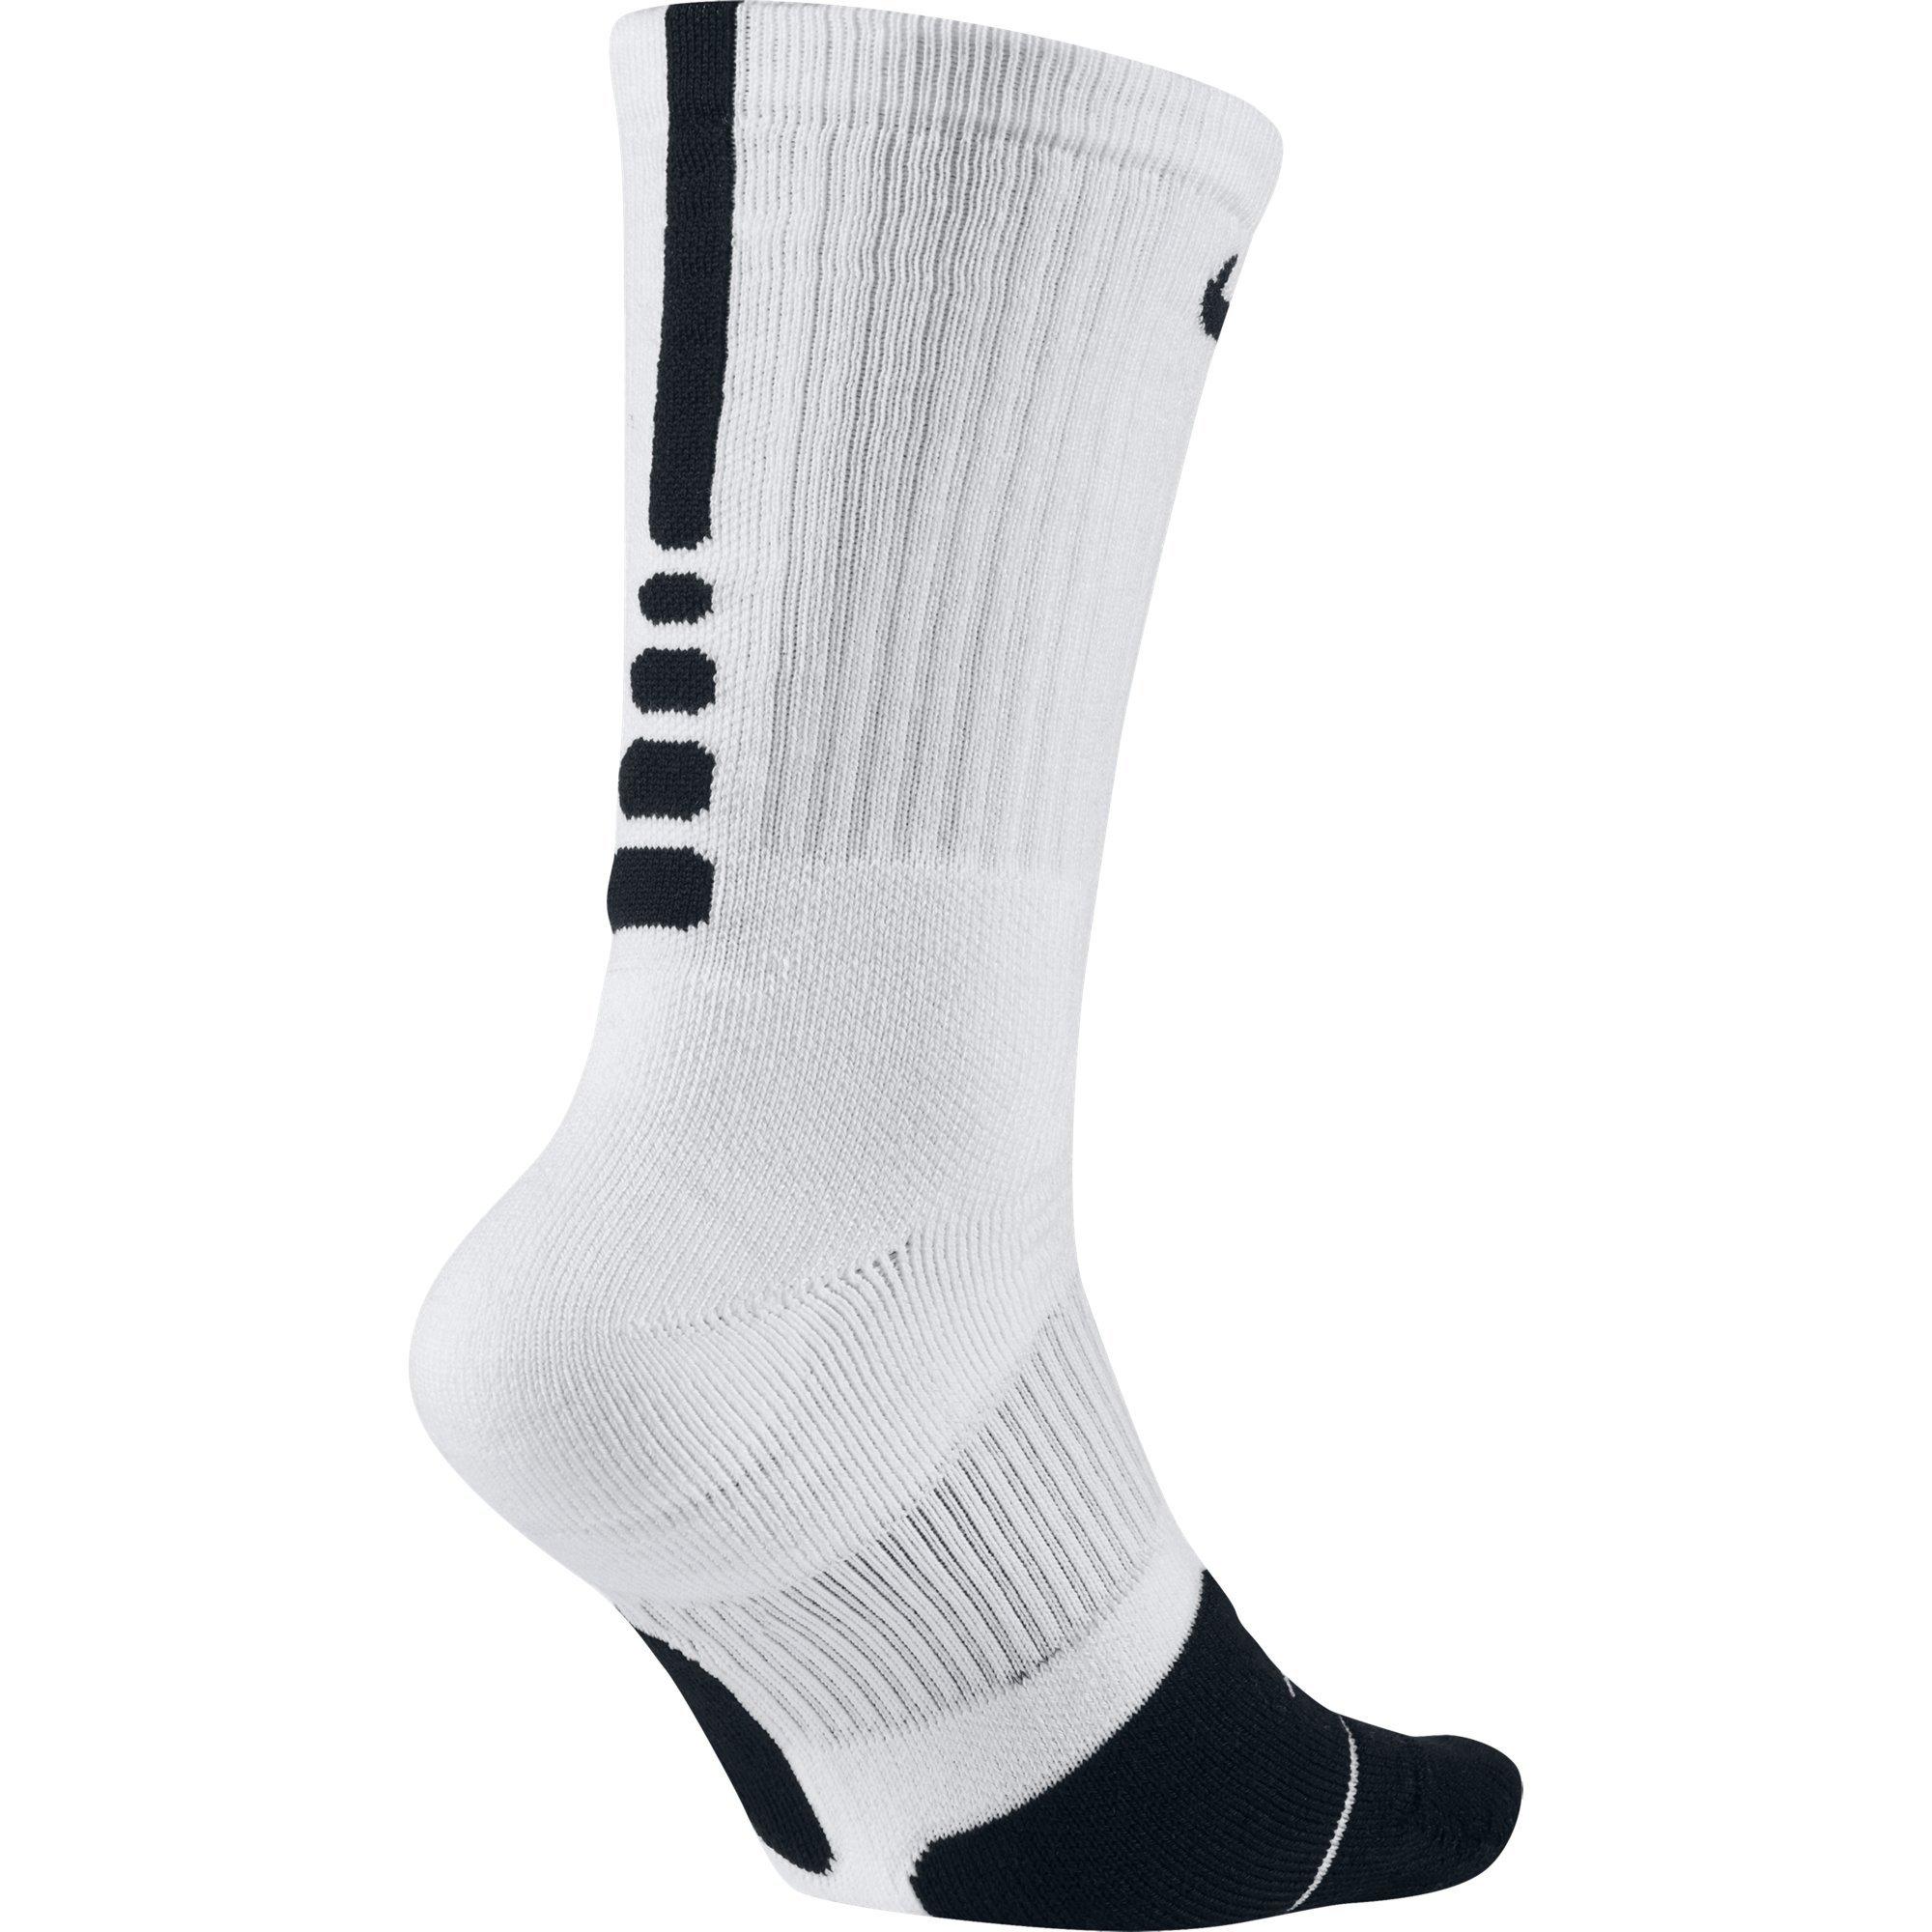 NIKE Unisex Dry Elite 1.5 Crew Basketball Socks (1 Pair), White/Black/Black, Small by NIKE (Image #3)